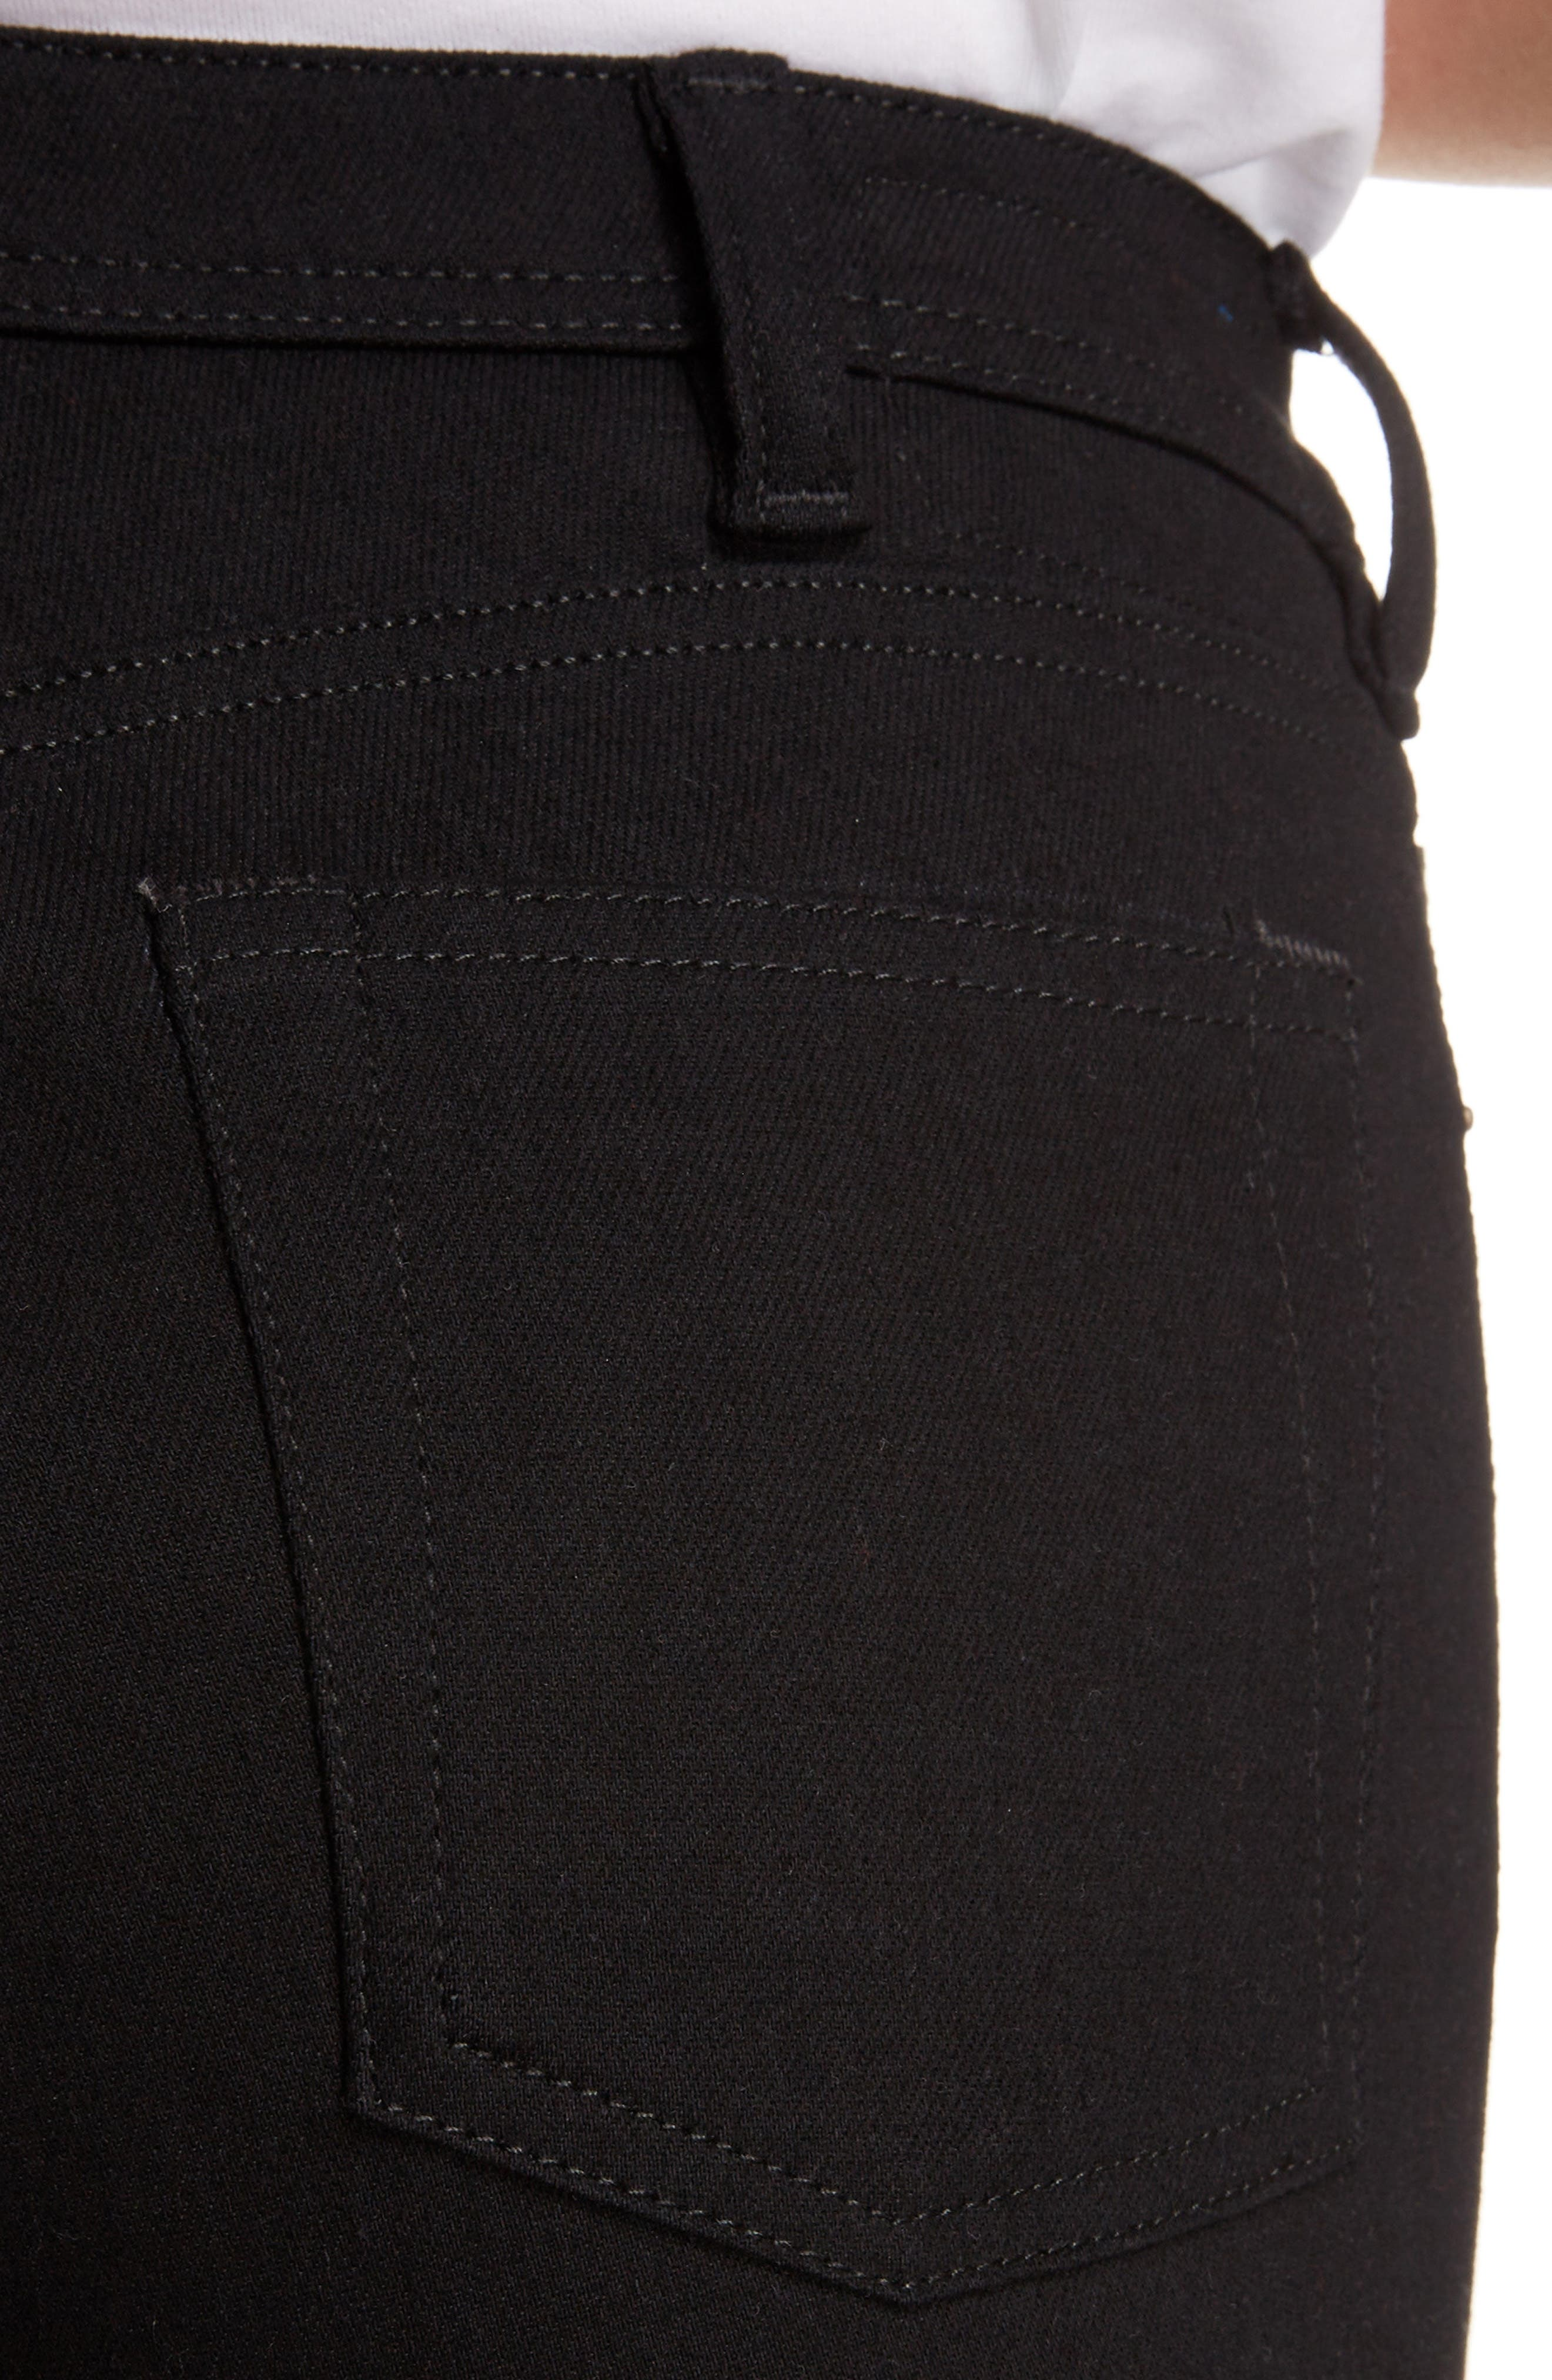 Peg High Waist Skinny Jeans,                             Alternate thumbnail 4, color,                             BLACK